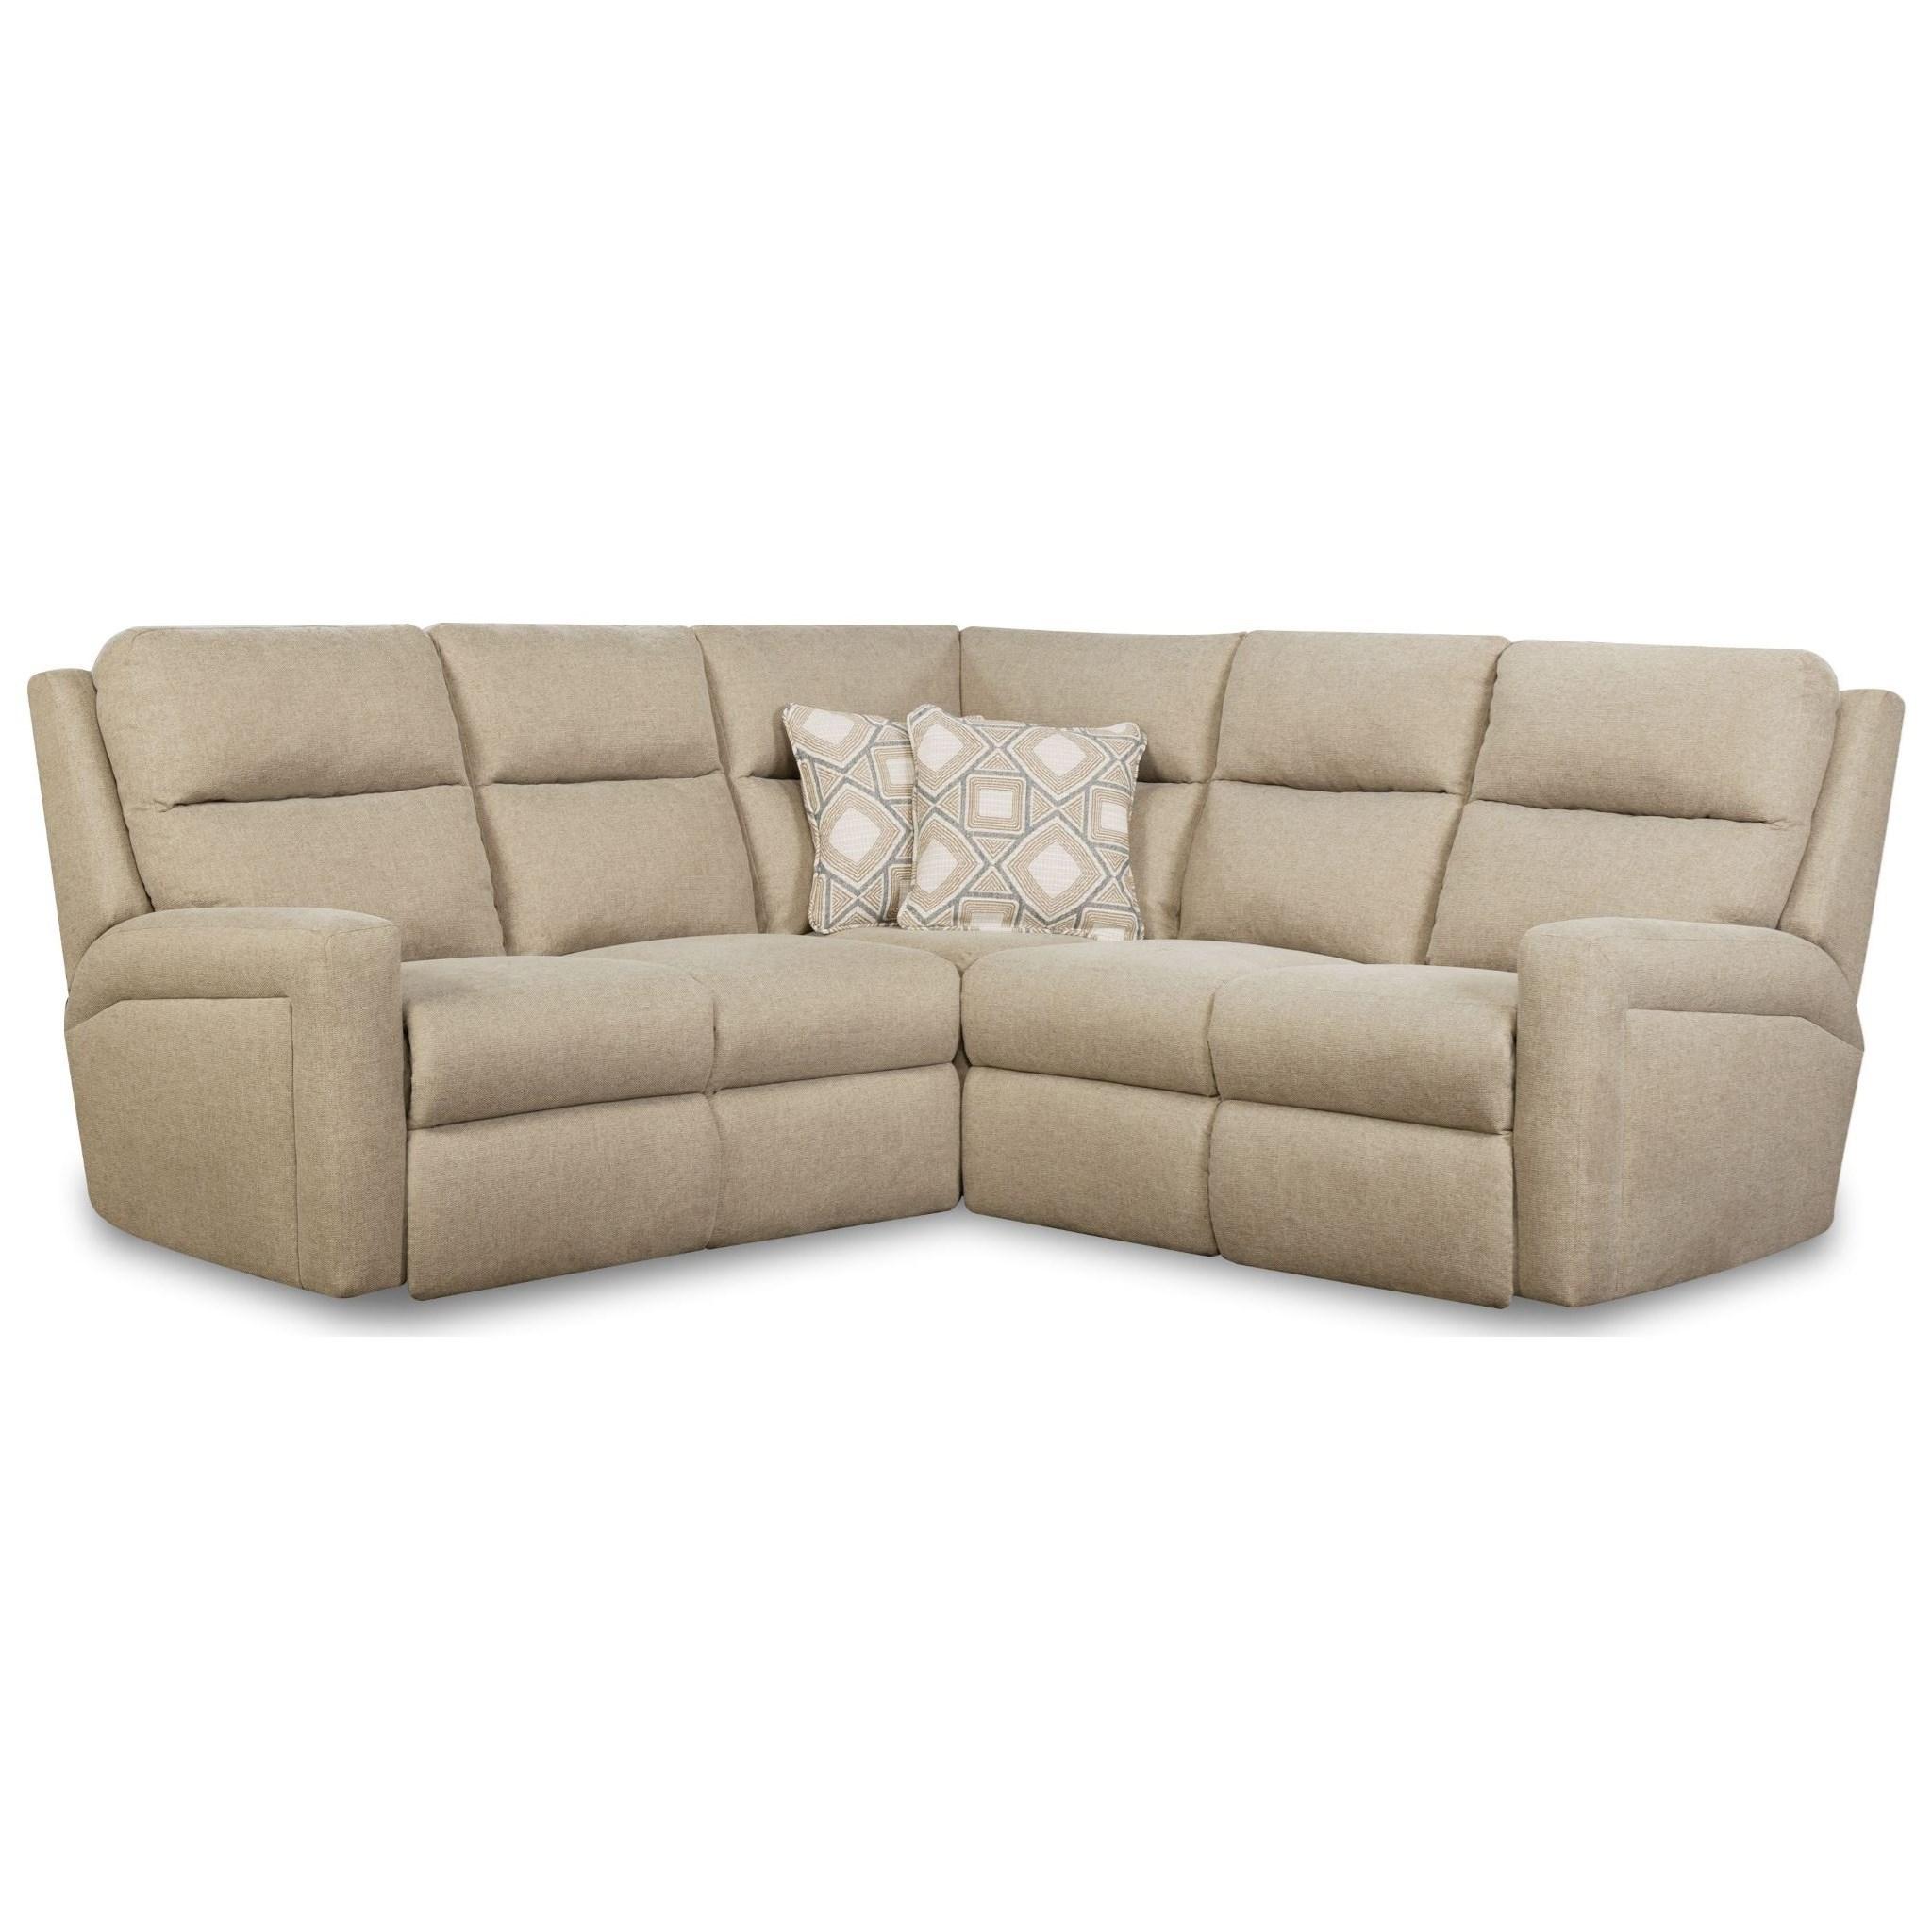 Wireless Power Reclining Sectional Sofa